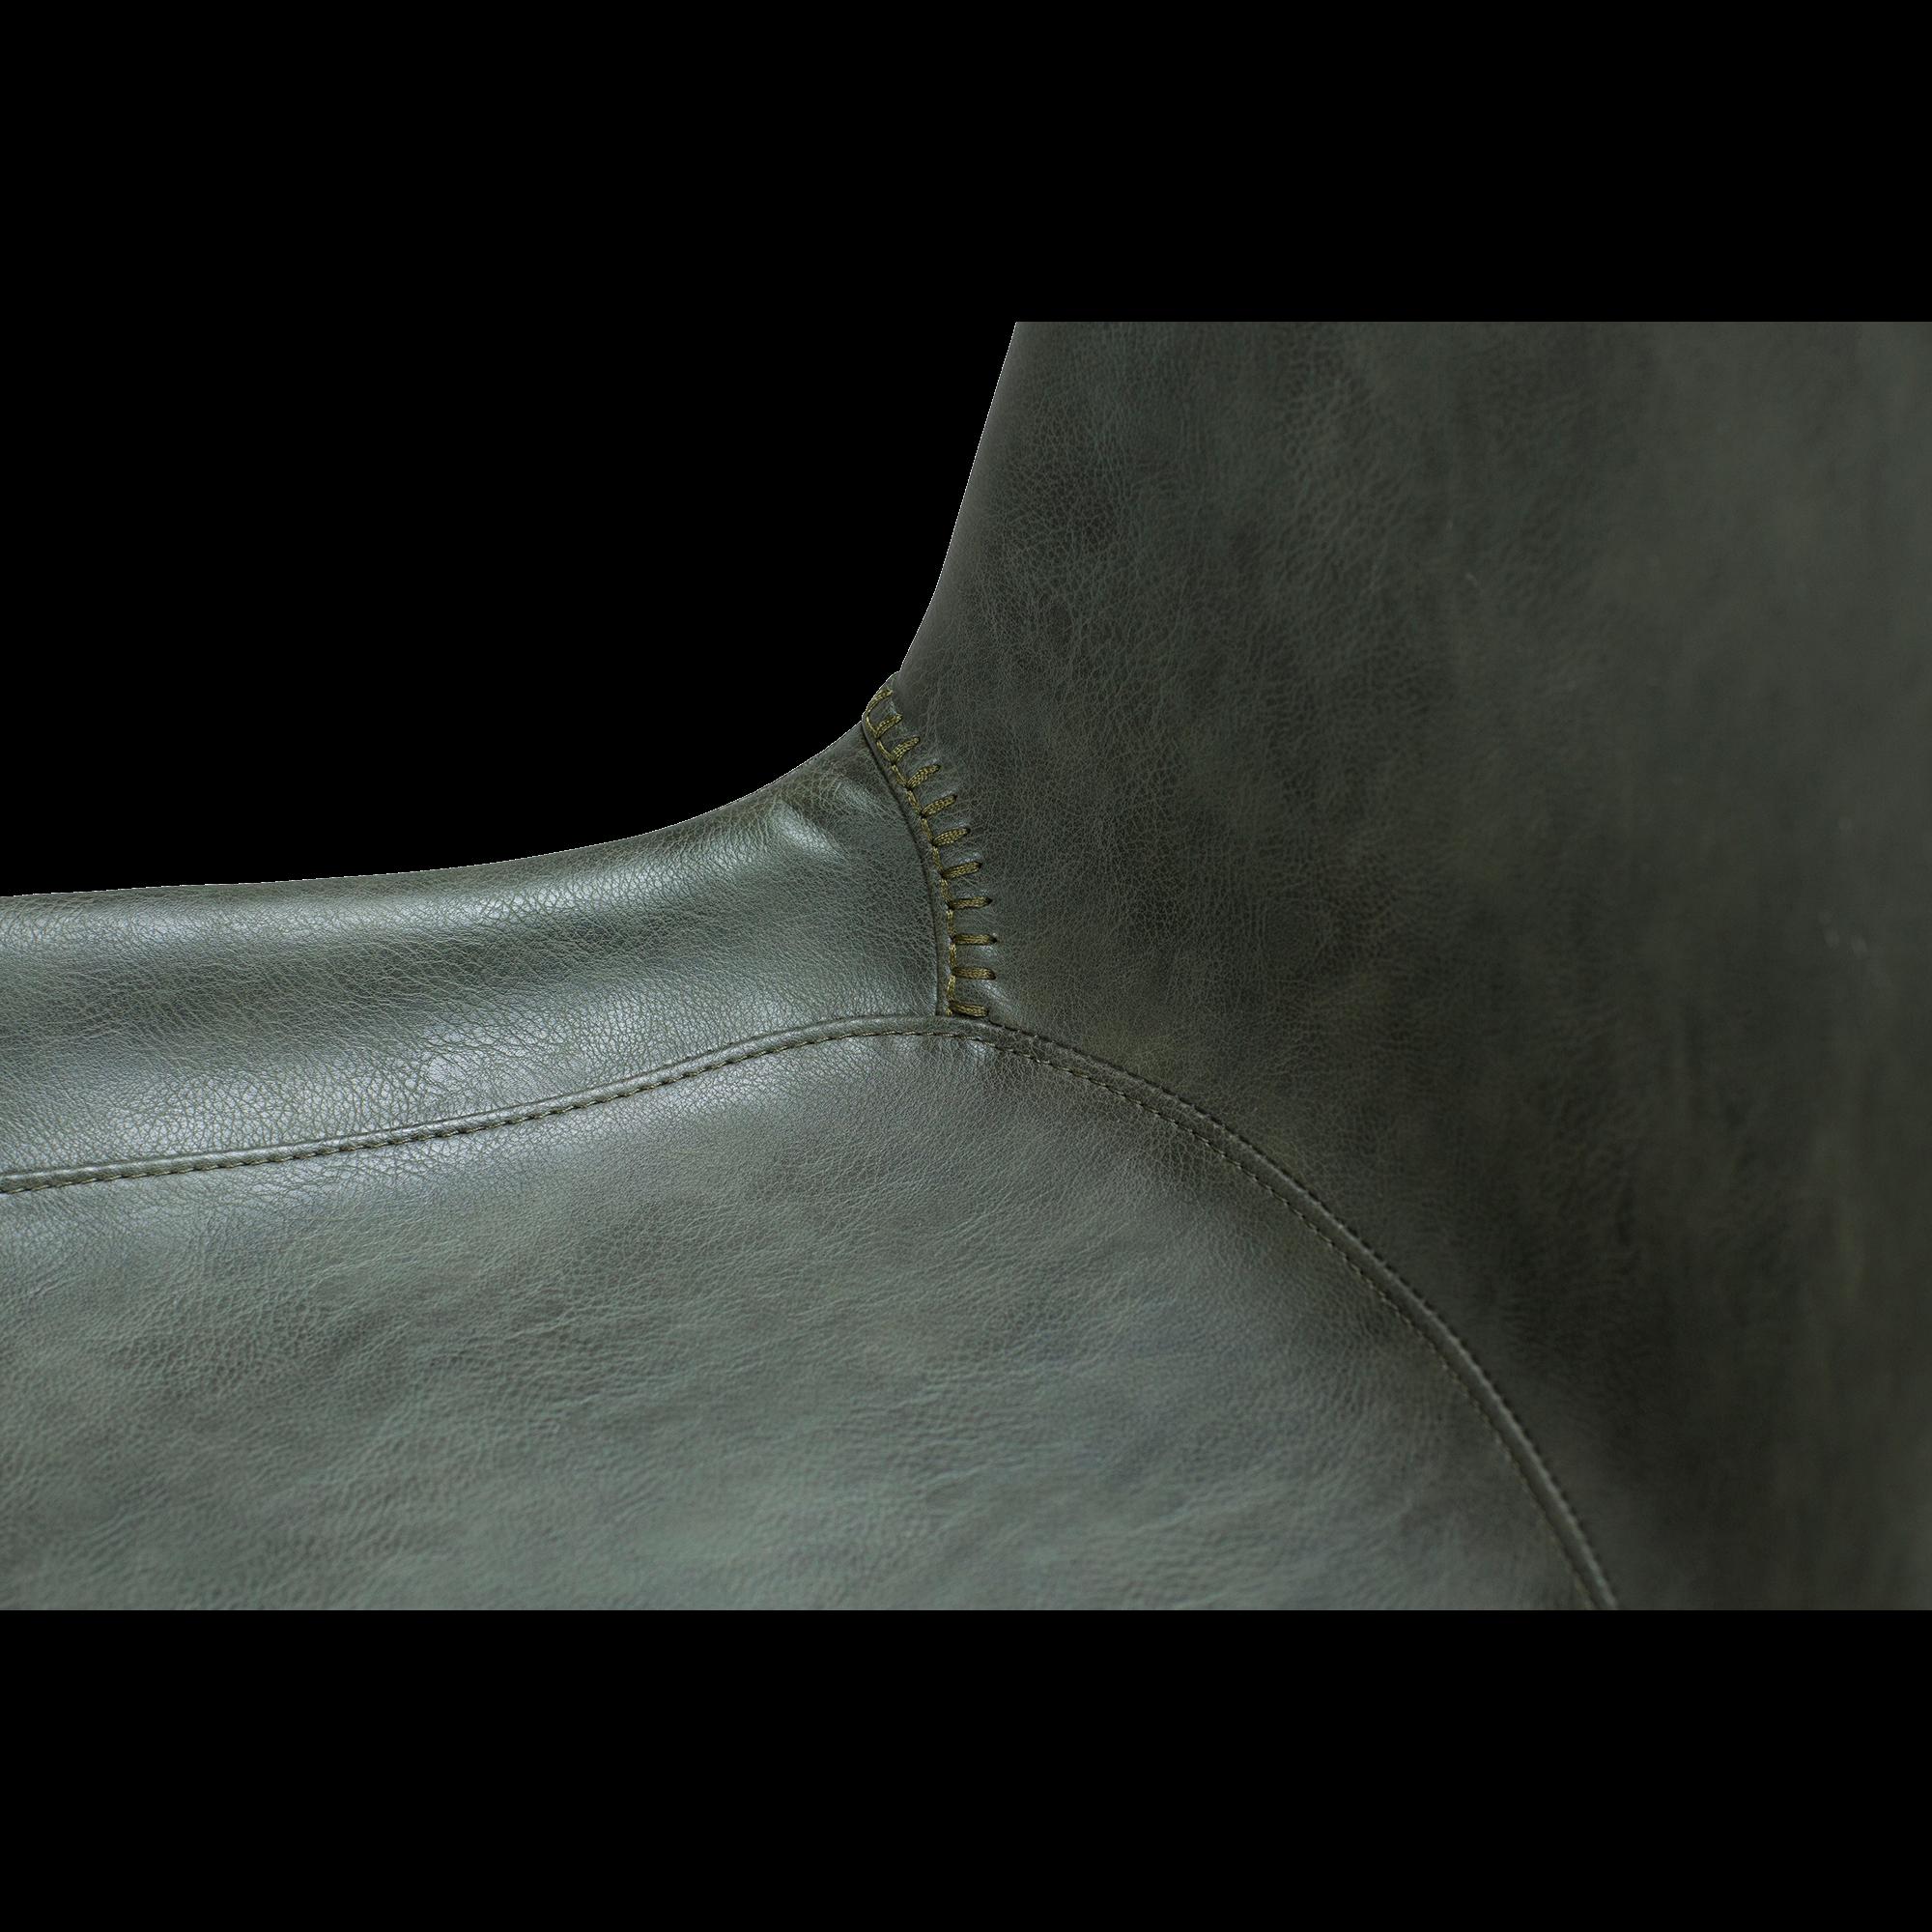 9113_2-3